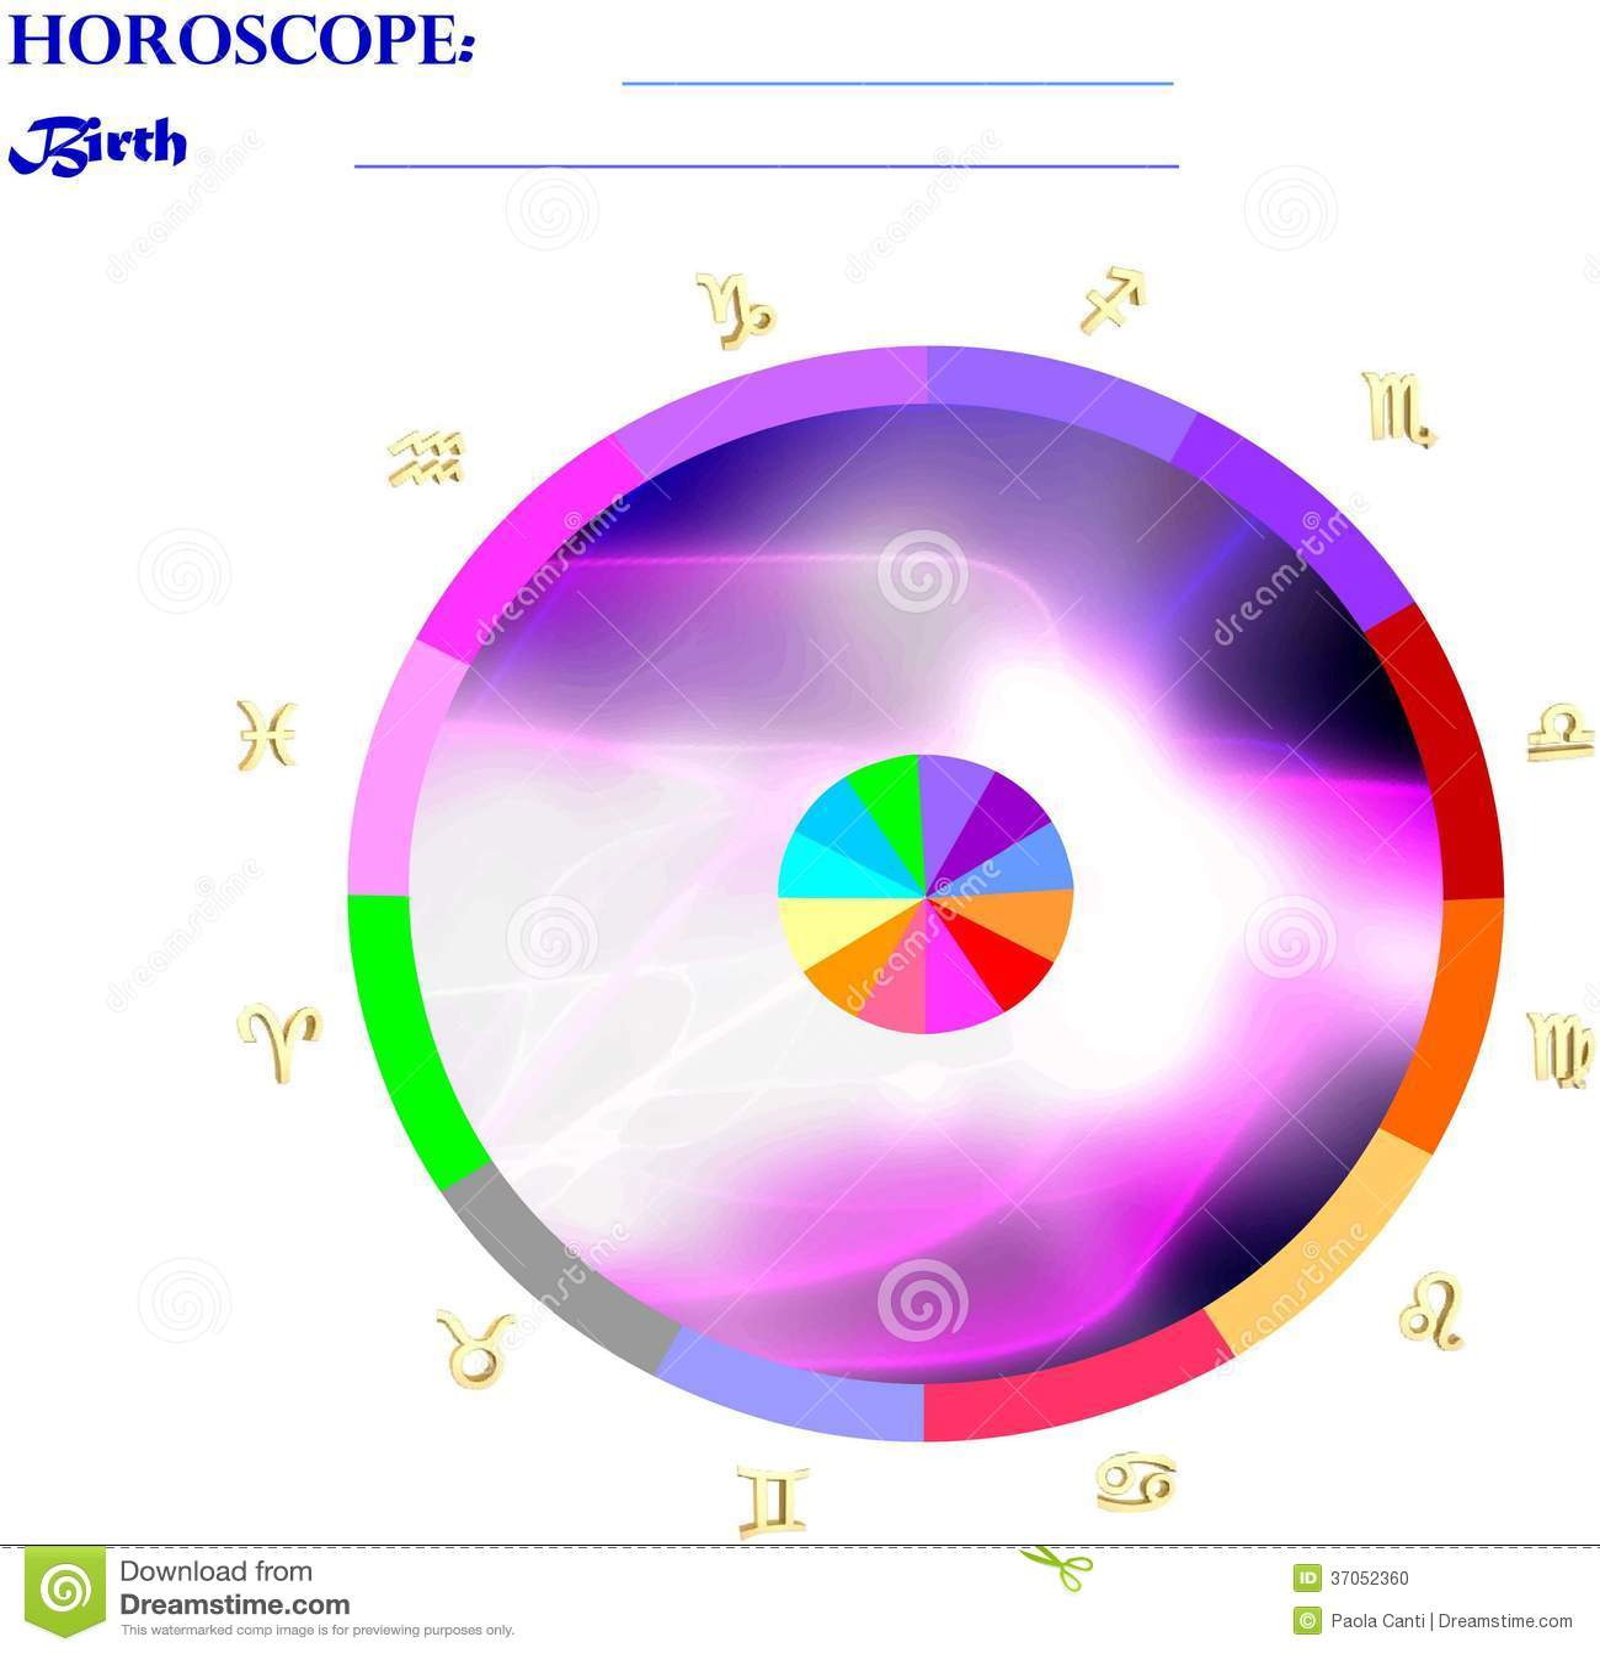 Horoscope birth chart stock illustration illustration of chart horoscope birth chart nvjuhfo Gallery